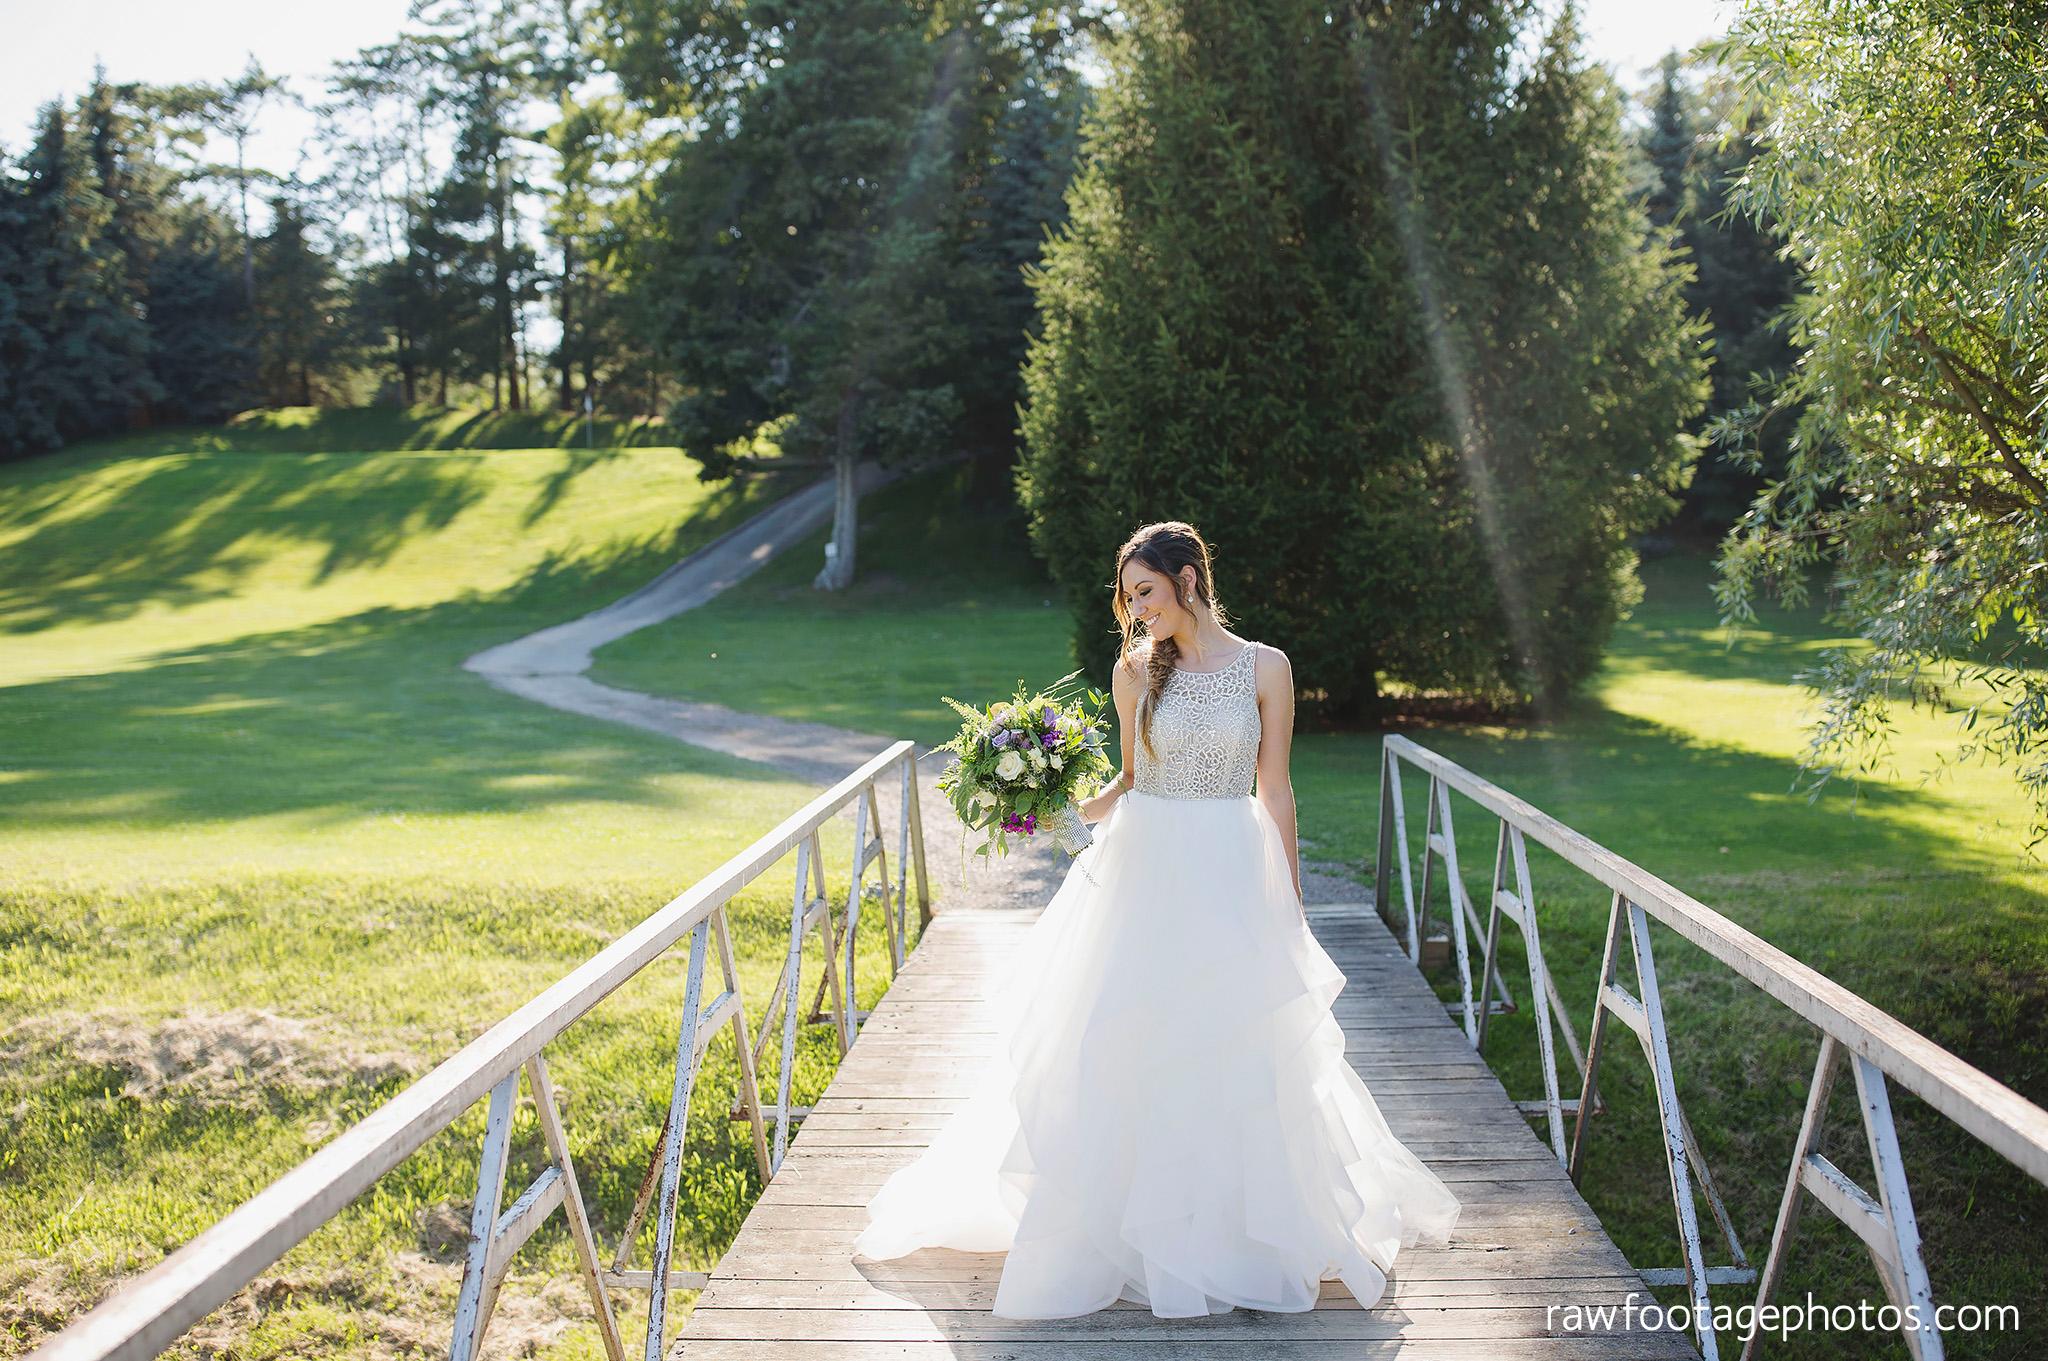 london_ontario_wedding_photographer-grand_bend_wedding_photographer-oakwood_resort_wedding-beach_wedding-sunset_wedding-raw_footage_photography050.jpg